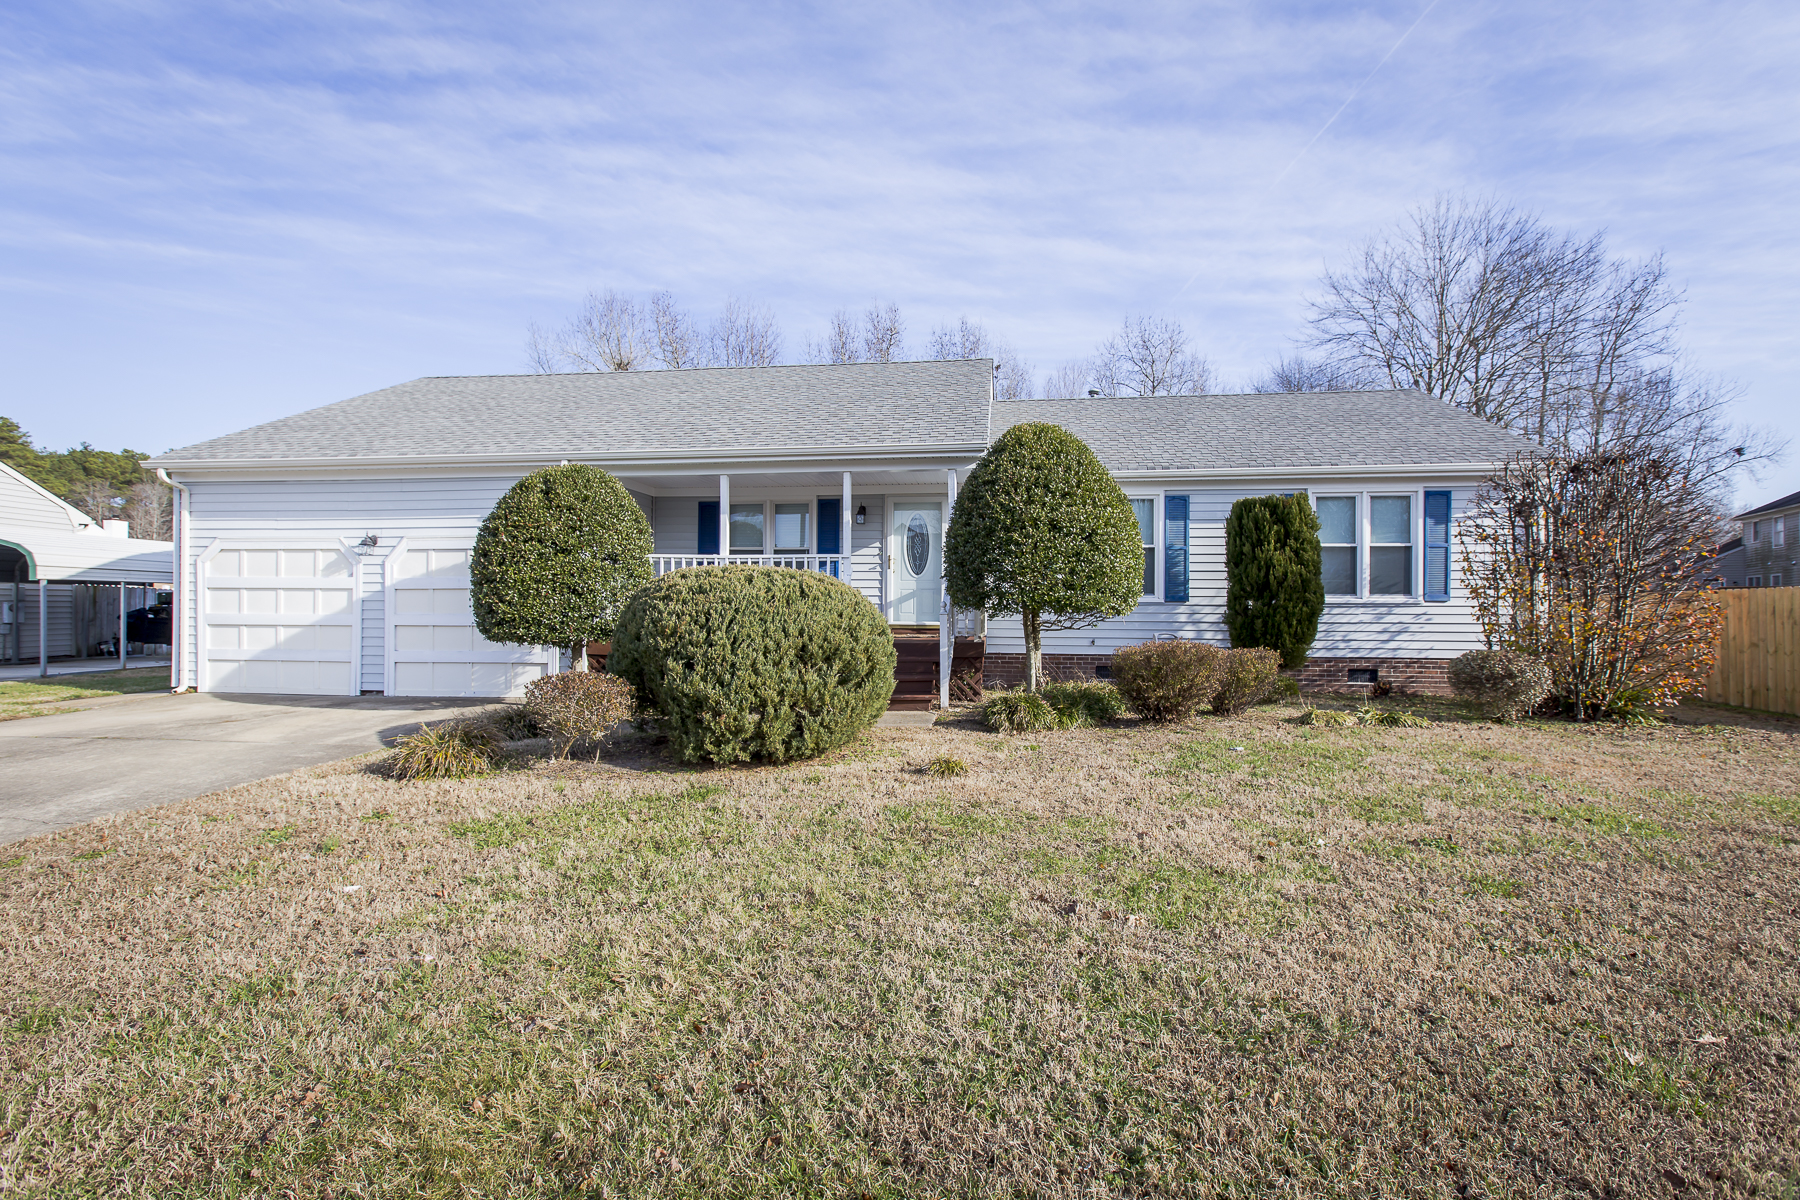 Single Family Home for Sale at Locks Landing 2331 Locks Landing Chesapeake, Virginia 23322 United States